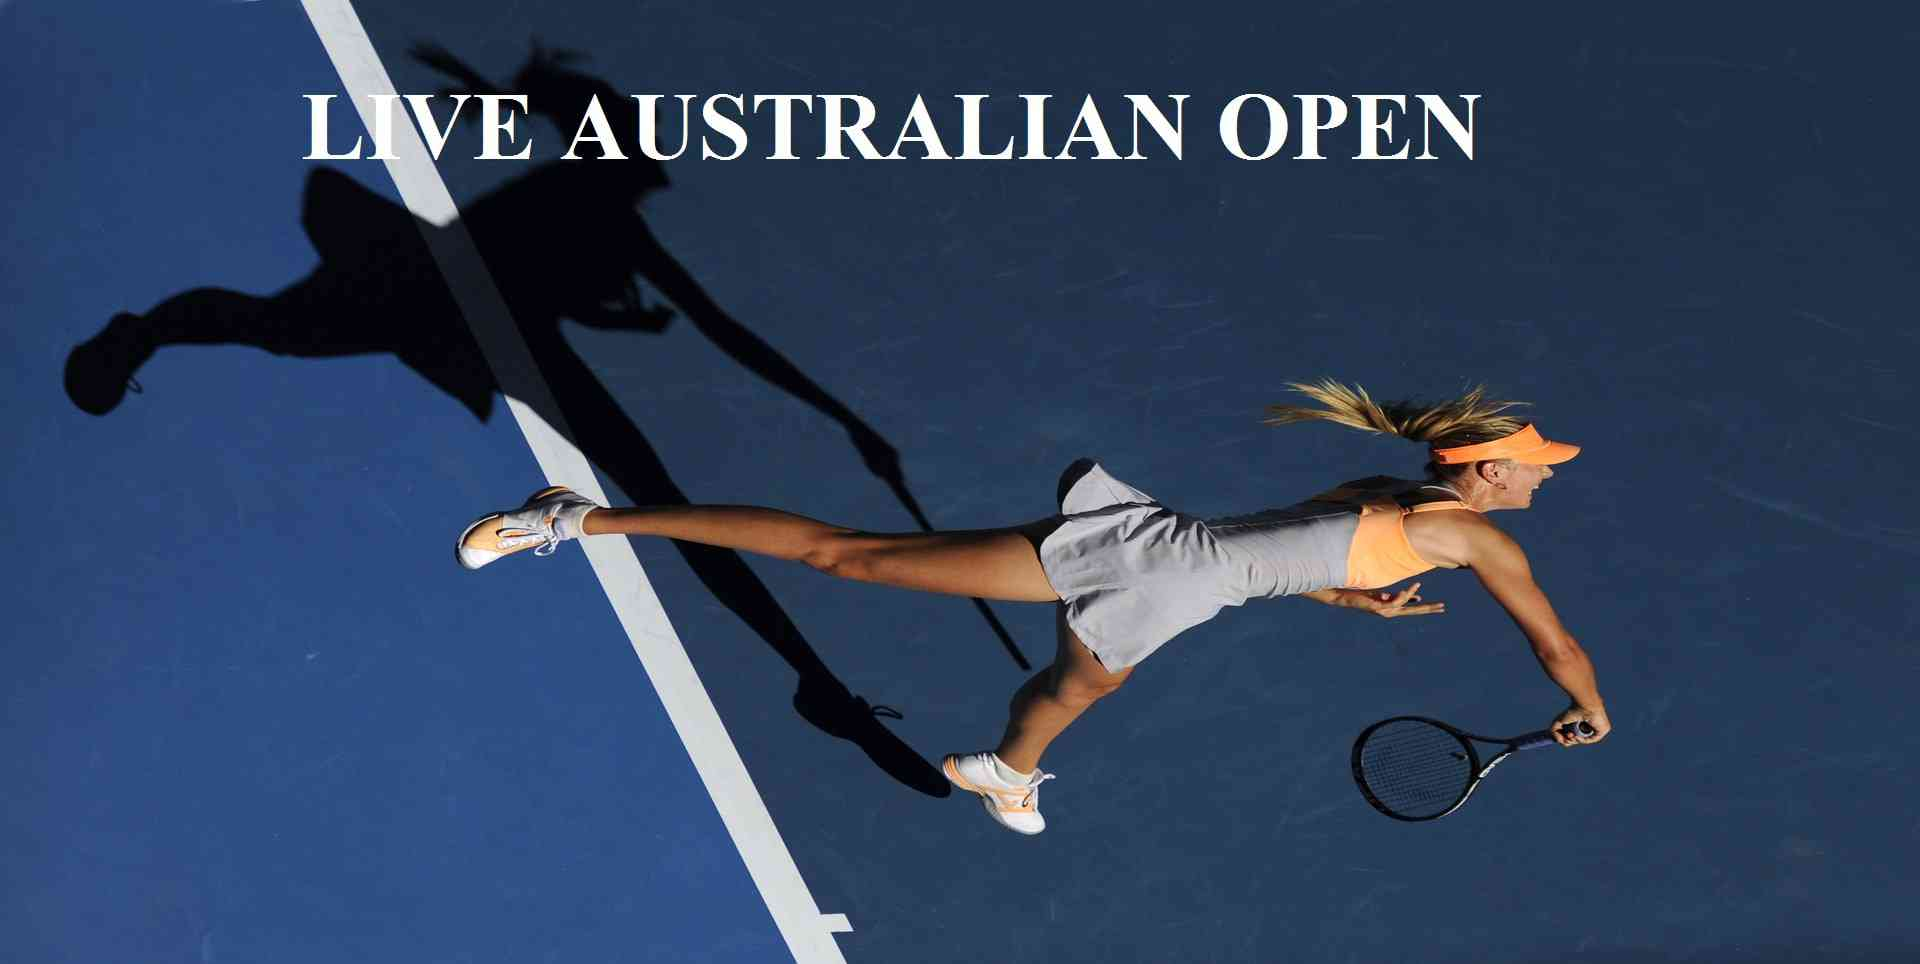 Live australian open 2018 opening ceremony online stopboris Choice Image